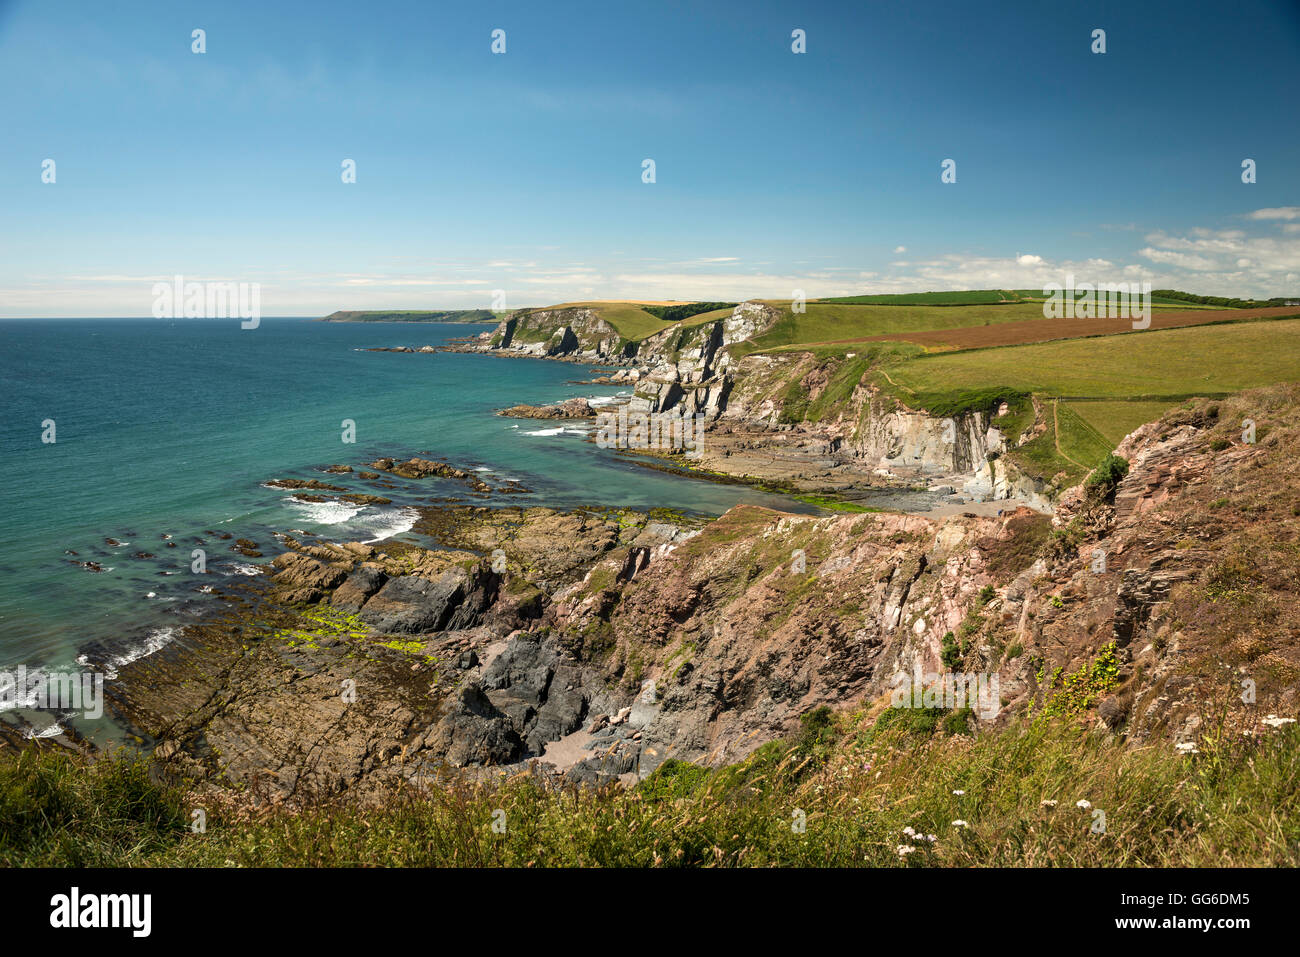 Ayrmer Cove near the village of Ringmore in The South Hams, Devon, UK - Stock Image